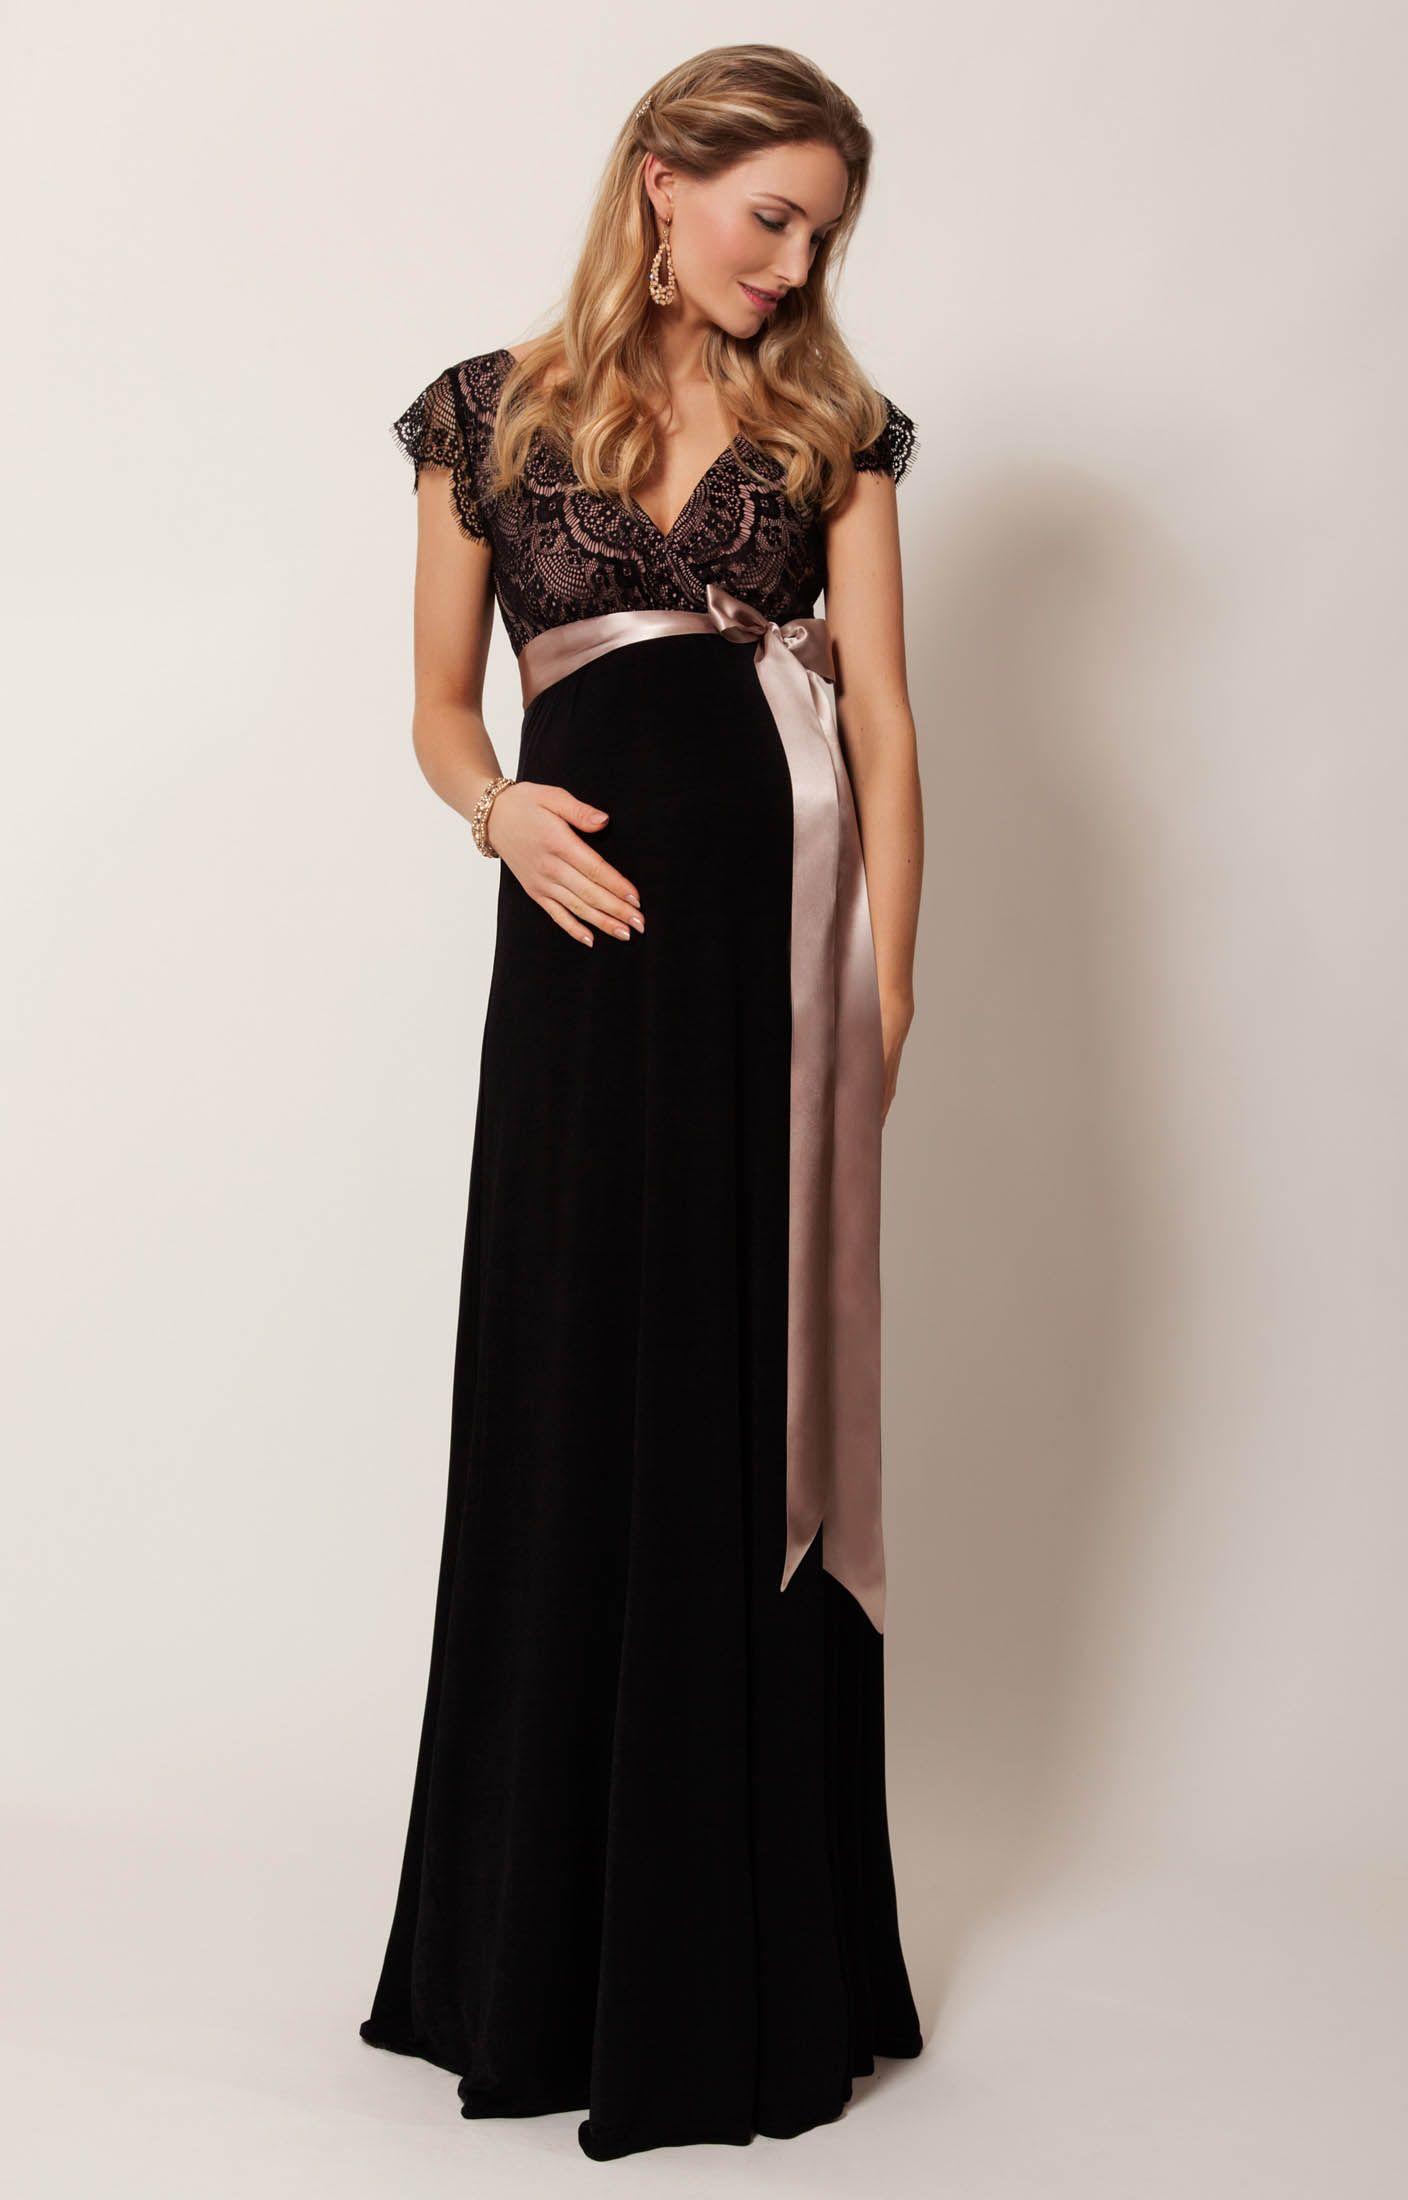 Rosa gown long pregnancy pinterest tiffany rose maternity